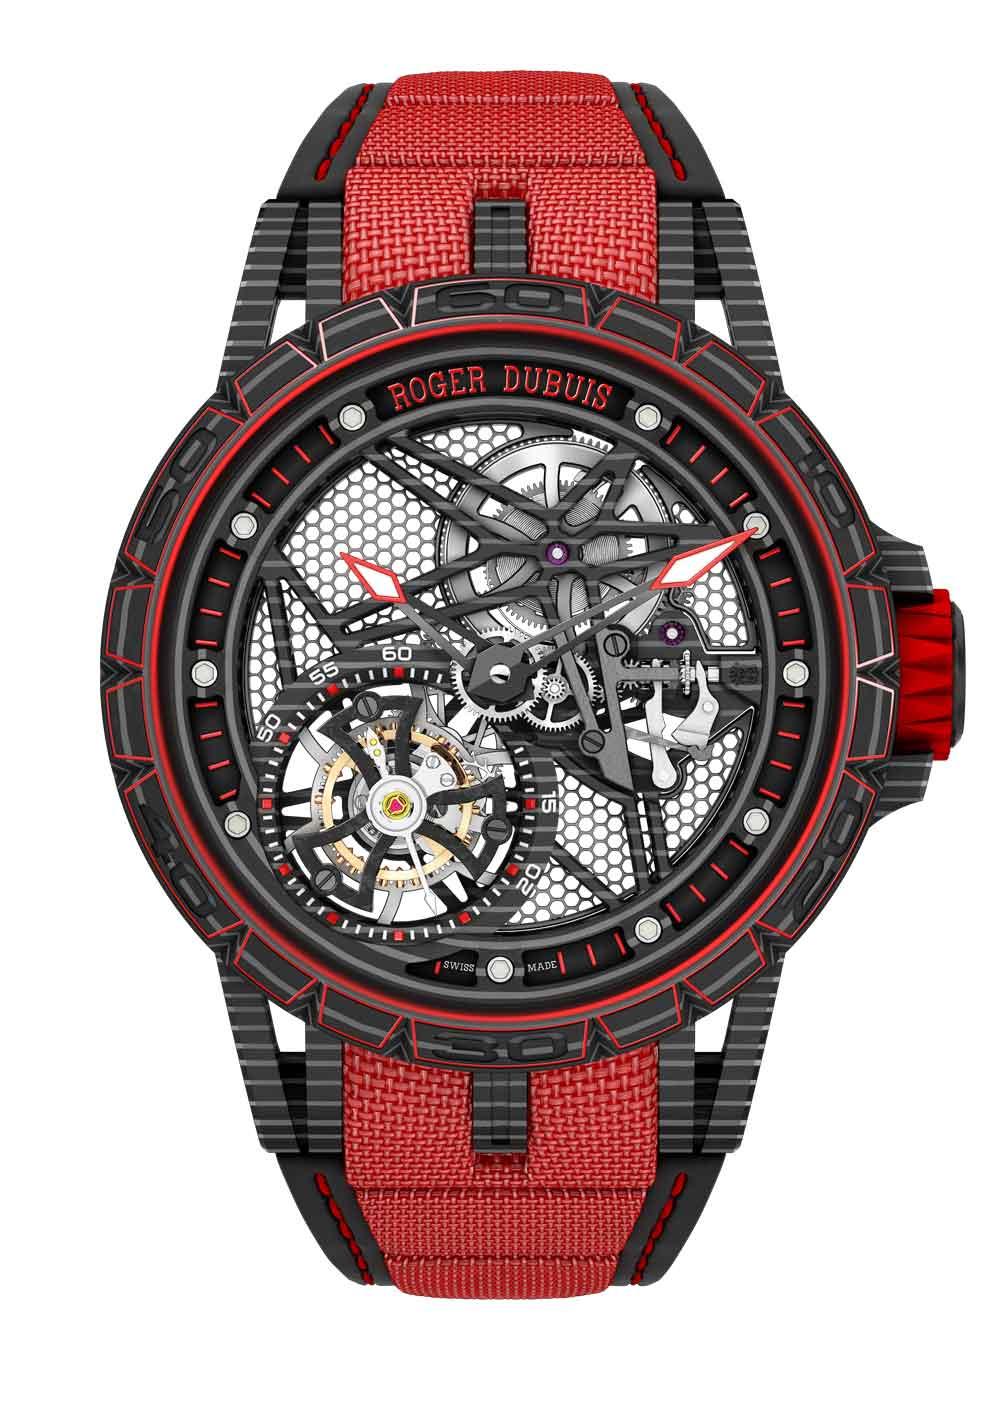 Reloj ROGER DUBUIS EXCALIBUR SPIDER CARBON